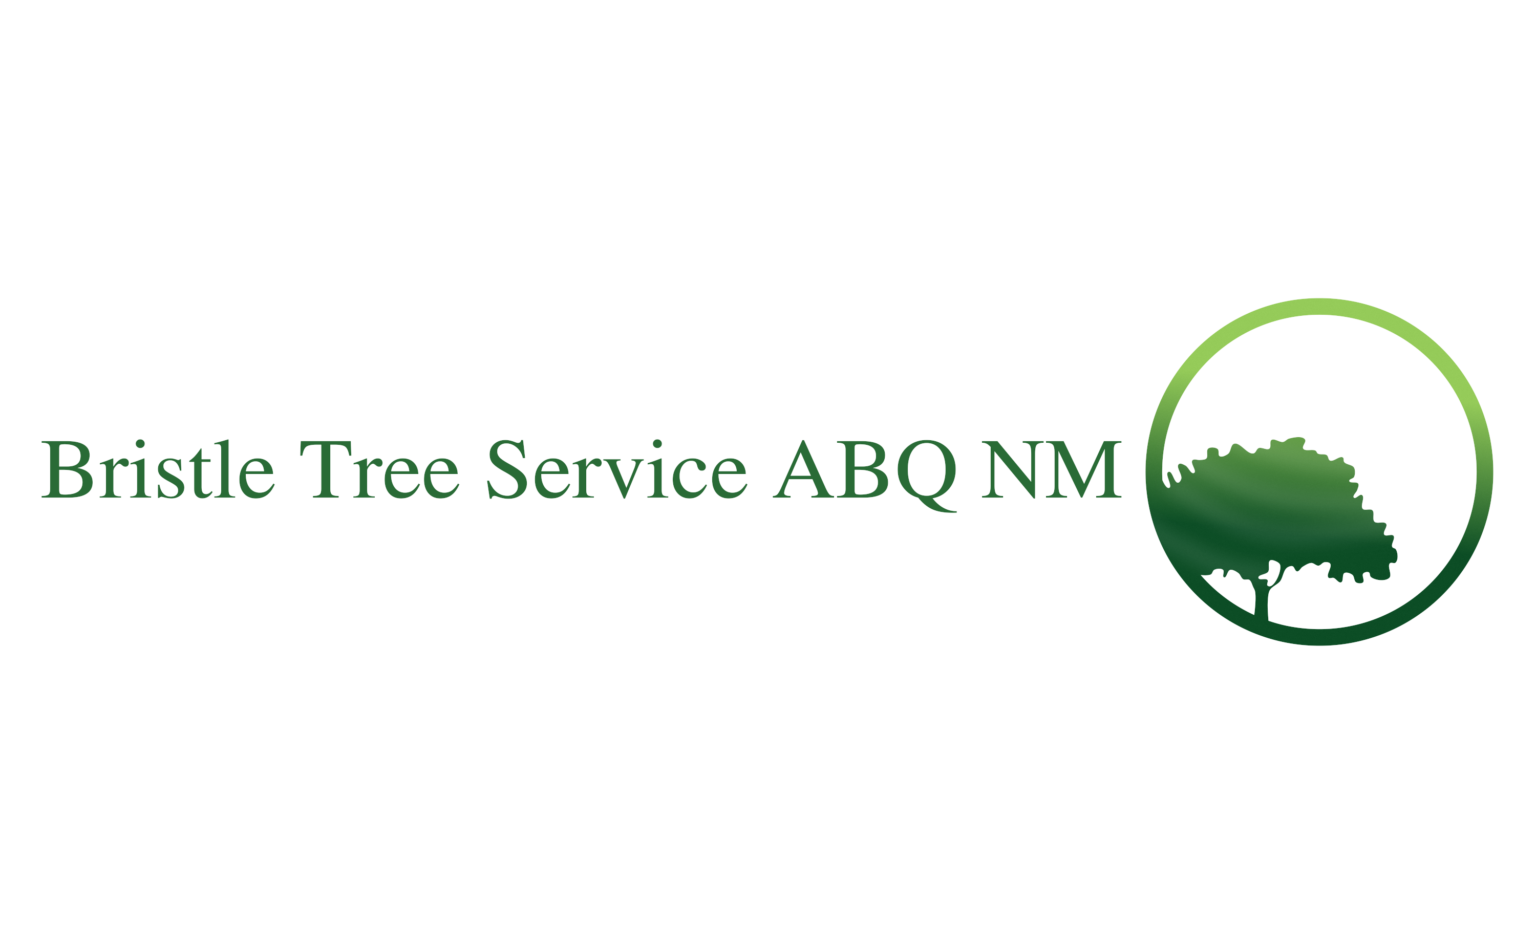 Bristle Tree Service Albuquerque NM Logo